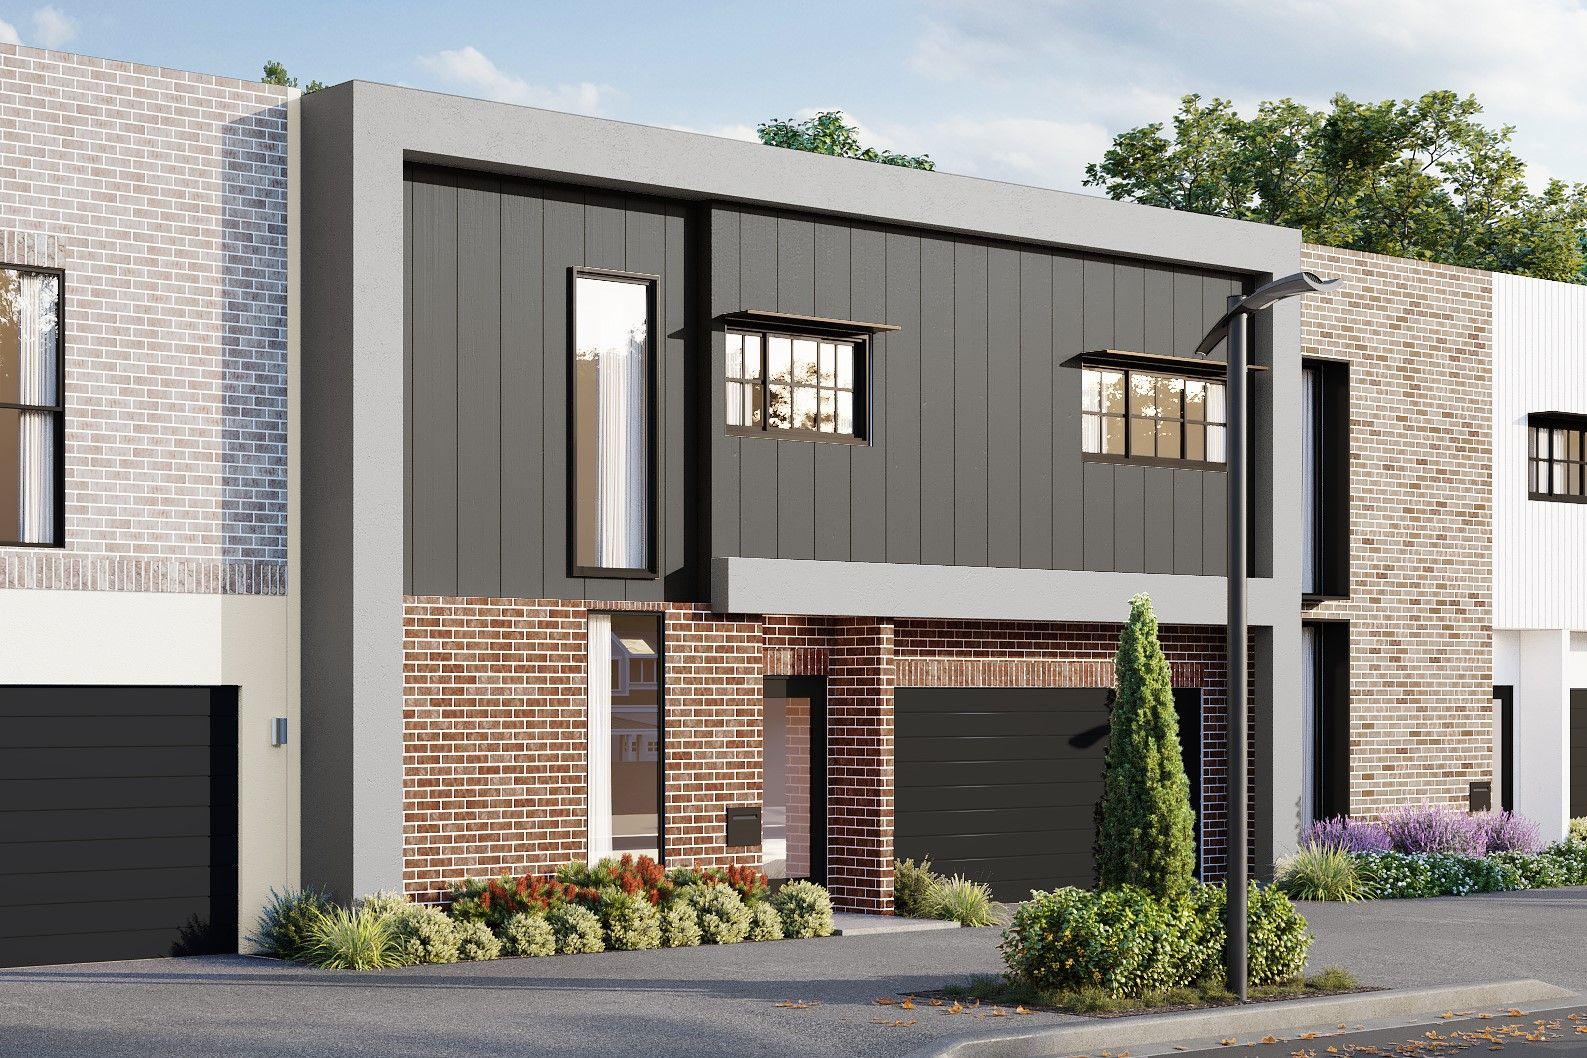 Lot 3071 Charlotte Avenue, Aura Central, Caloundra West QLD 4551, Image 0